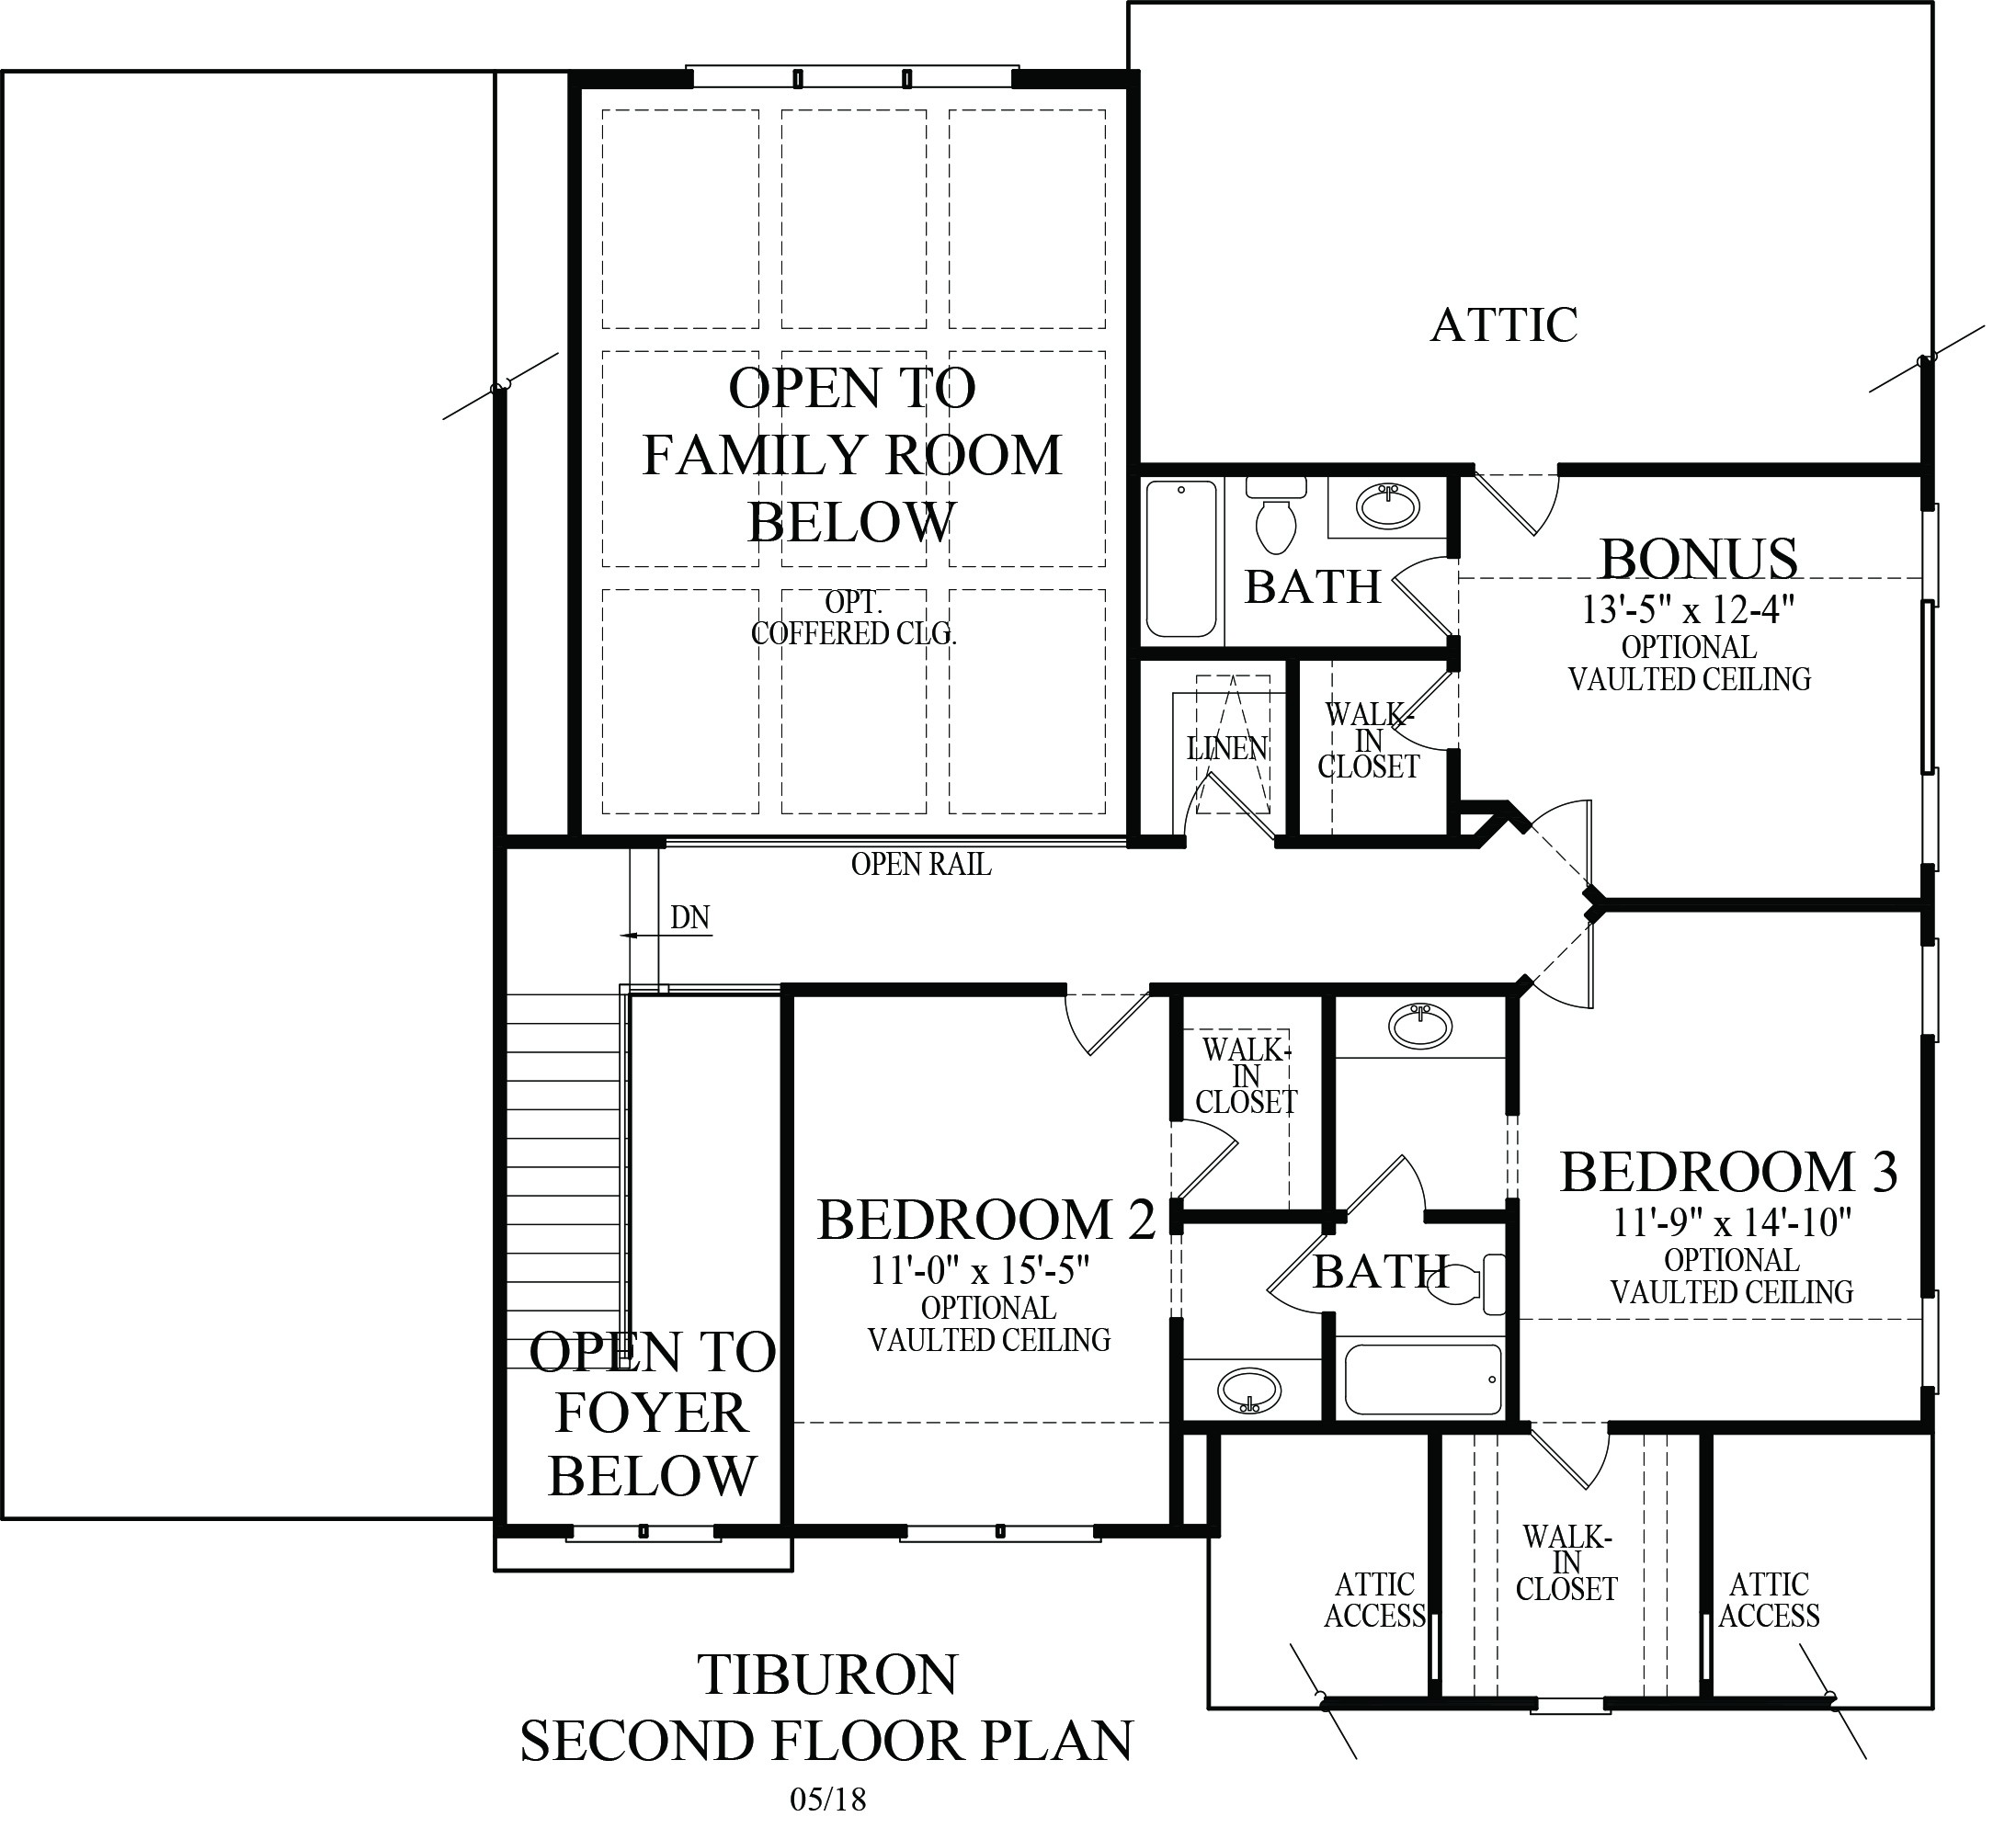 Tiburon-2nd-Floor-Plan-1.jpg